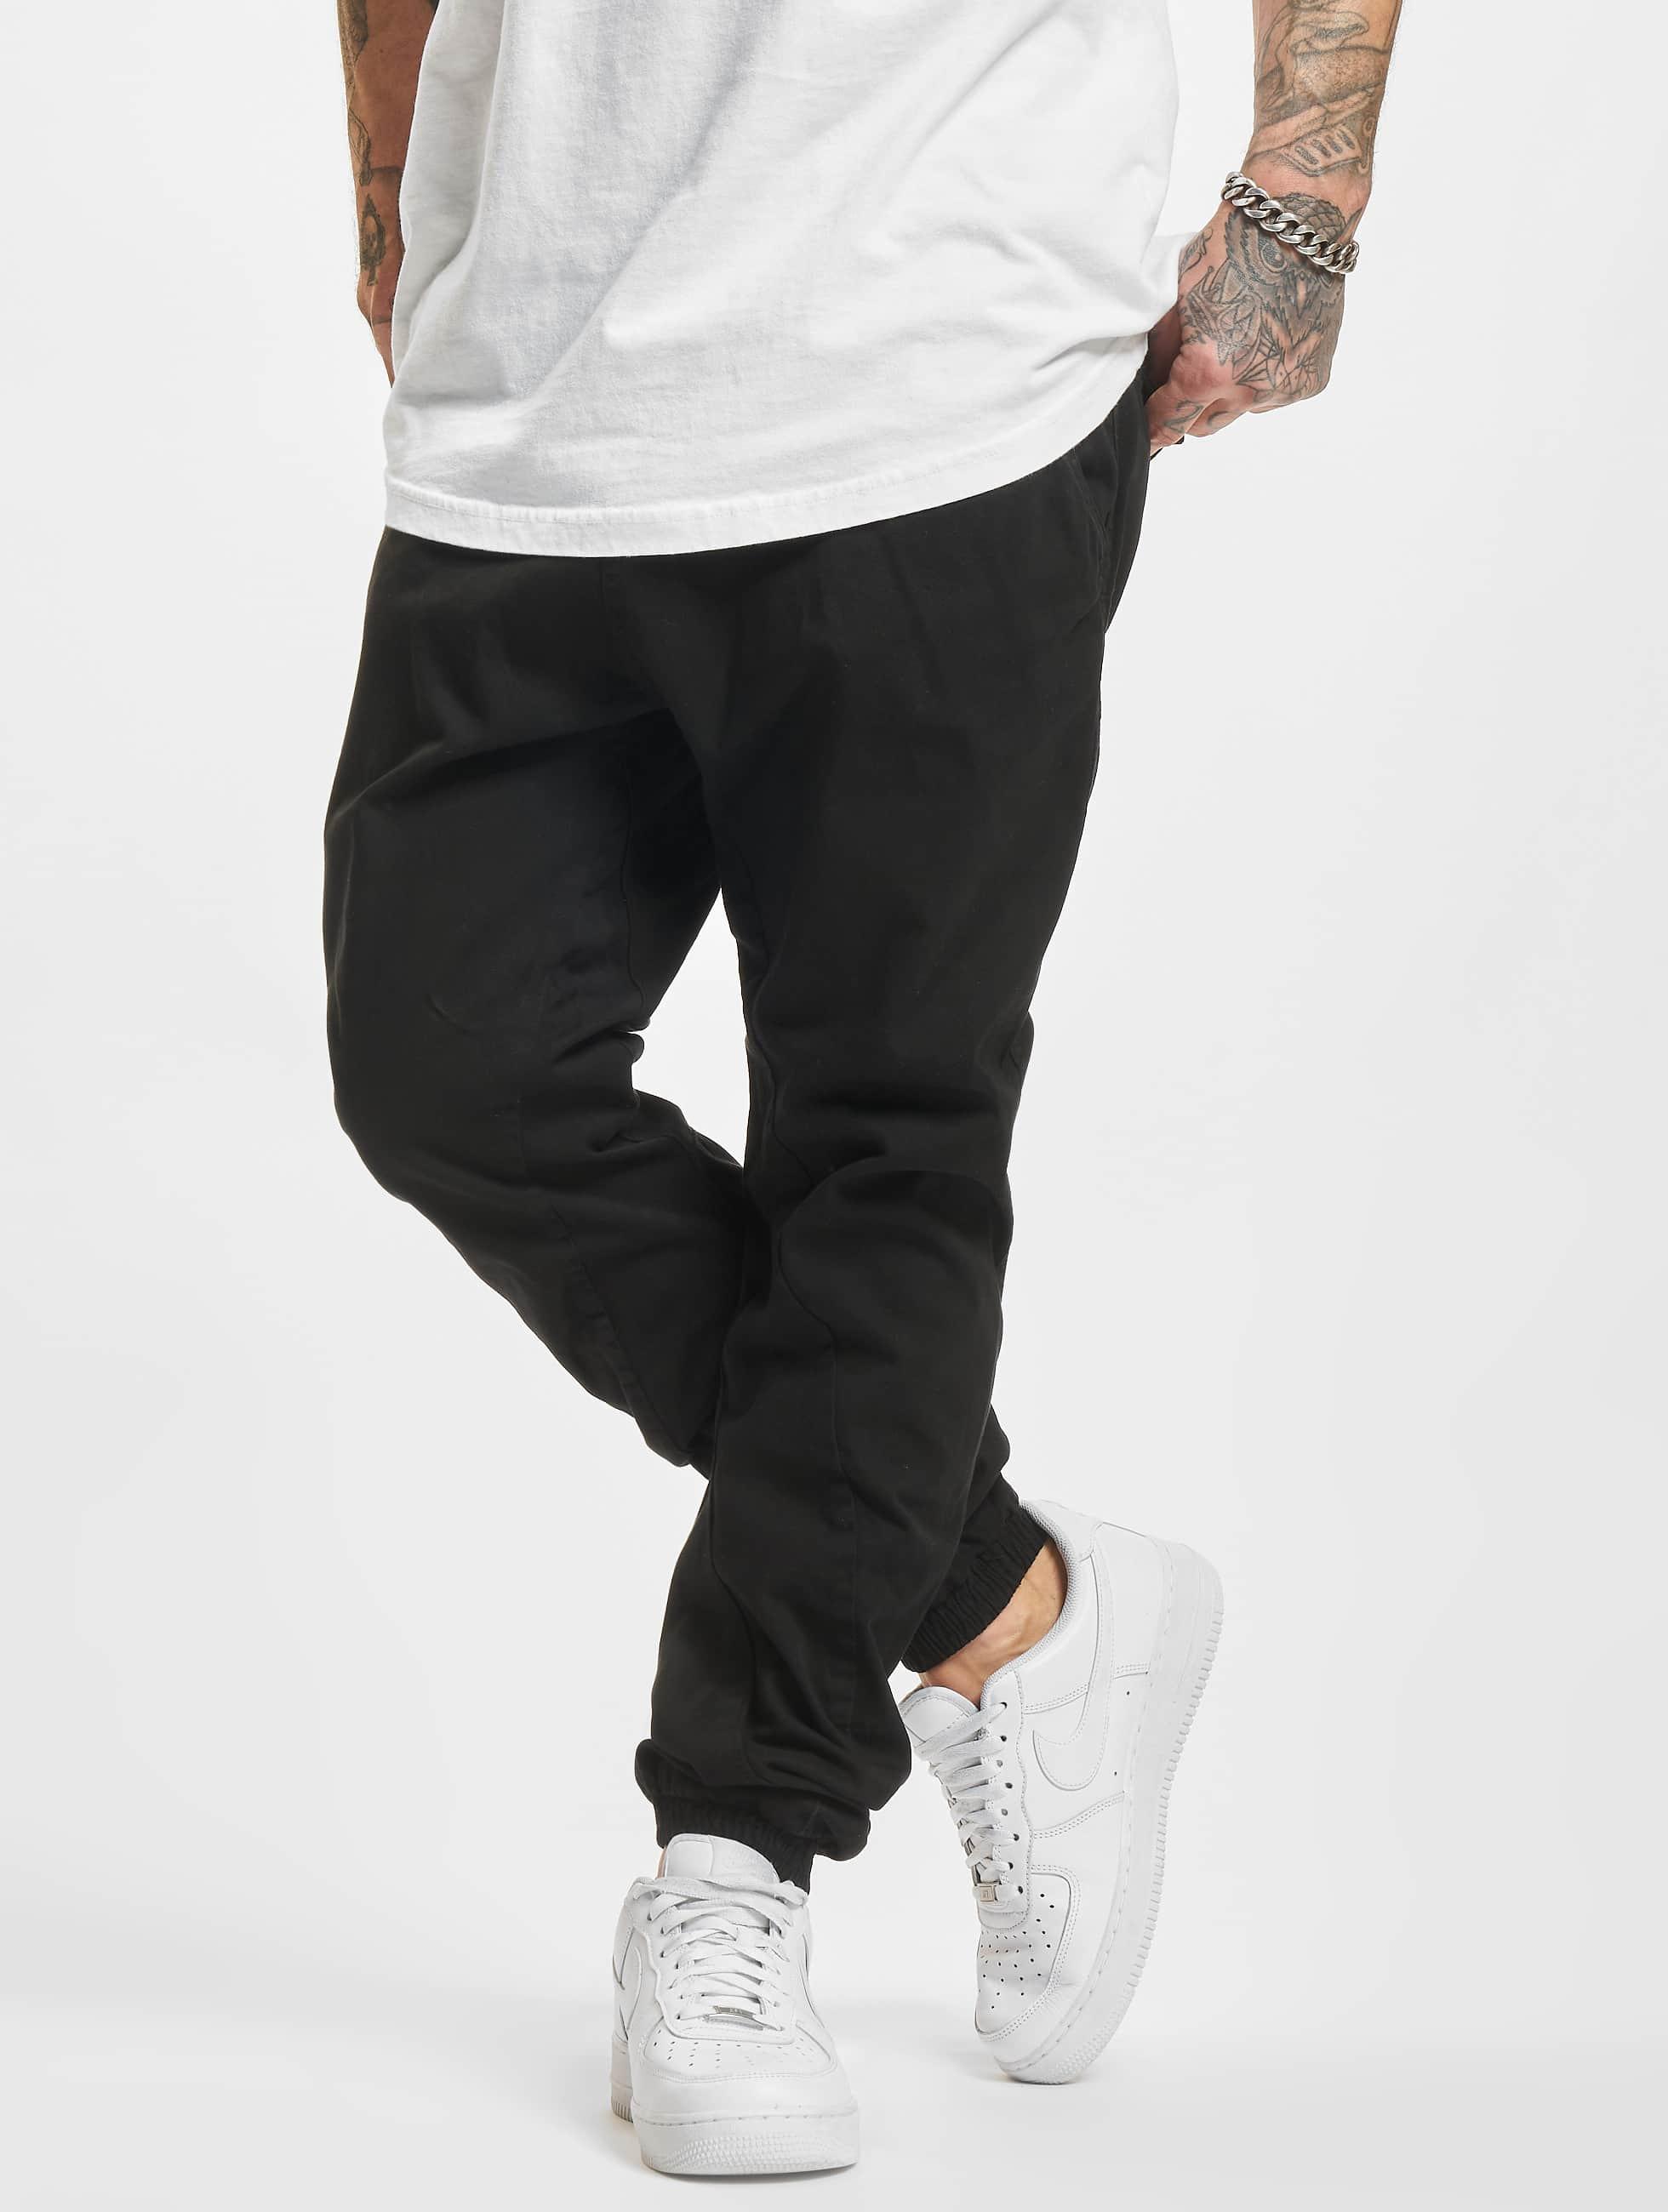 Urban Classics Männer Jogginghose Stretch in schwarz